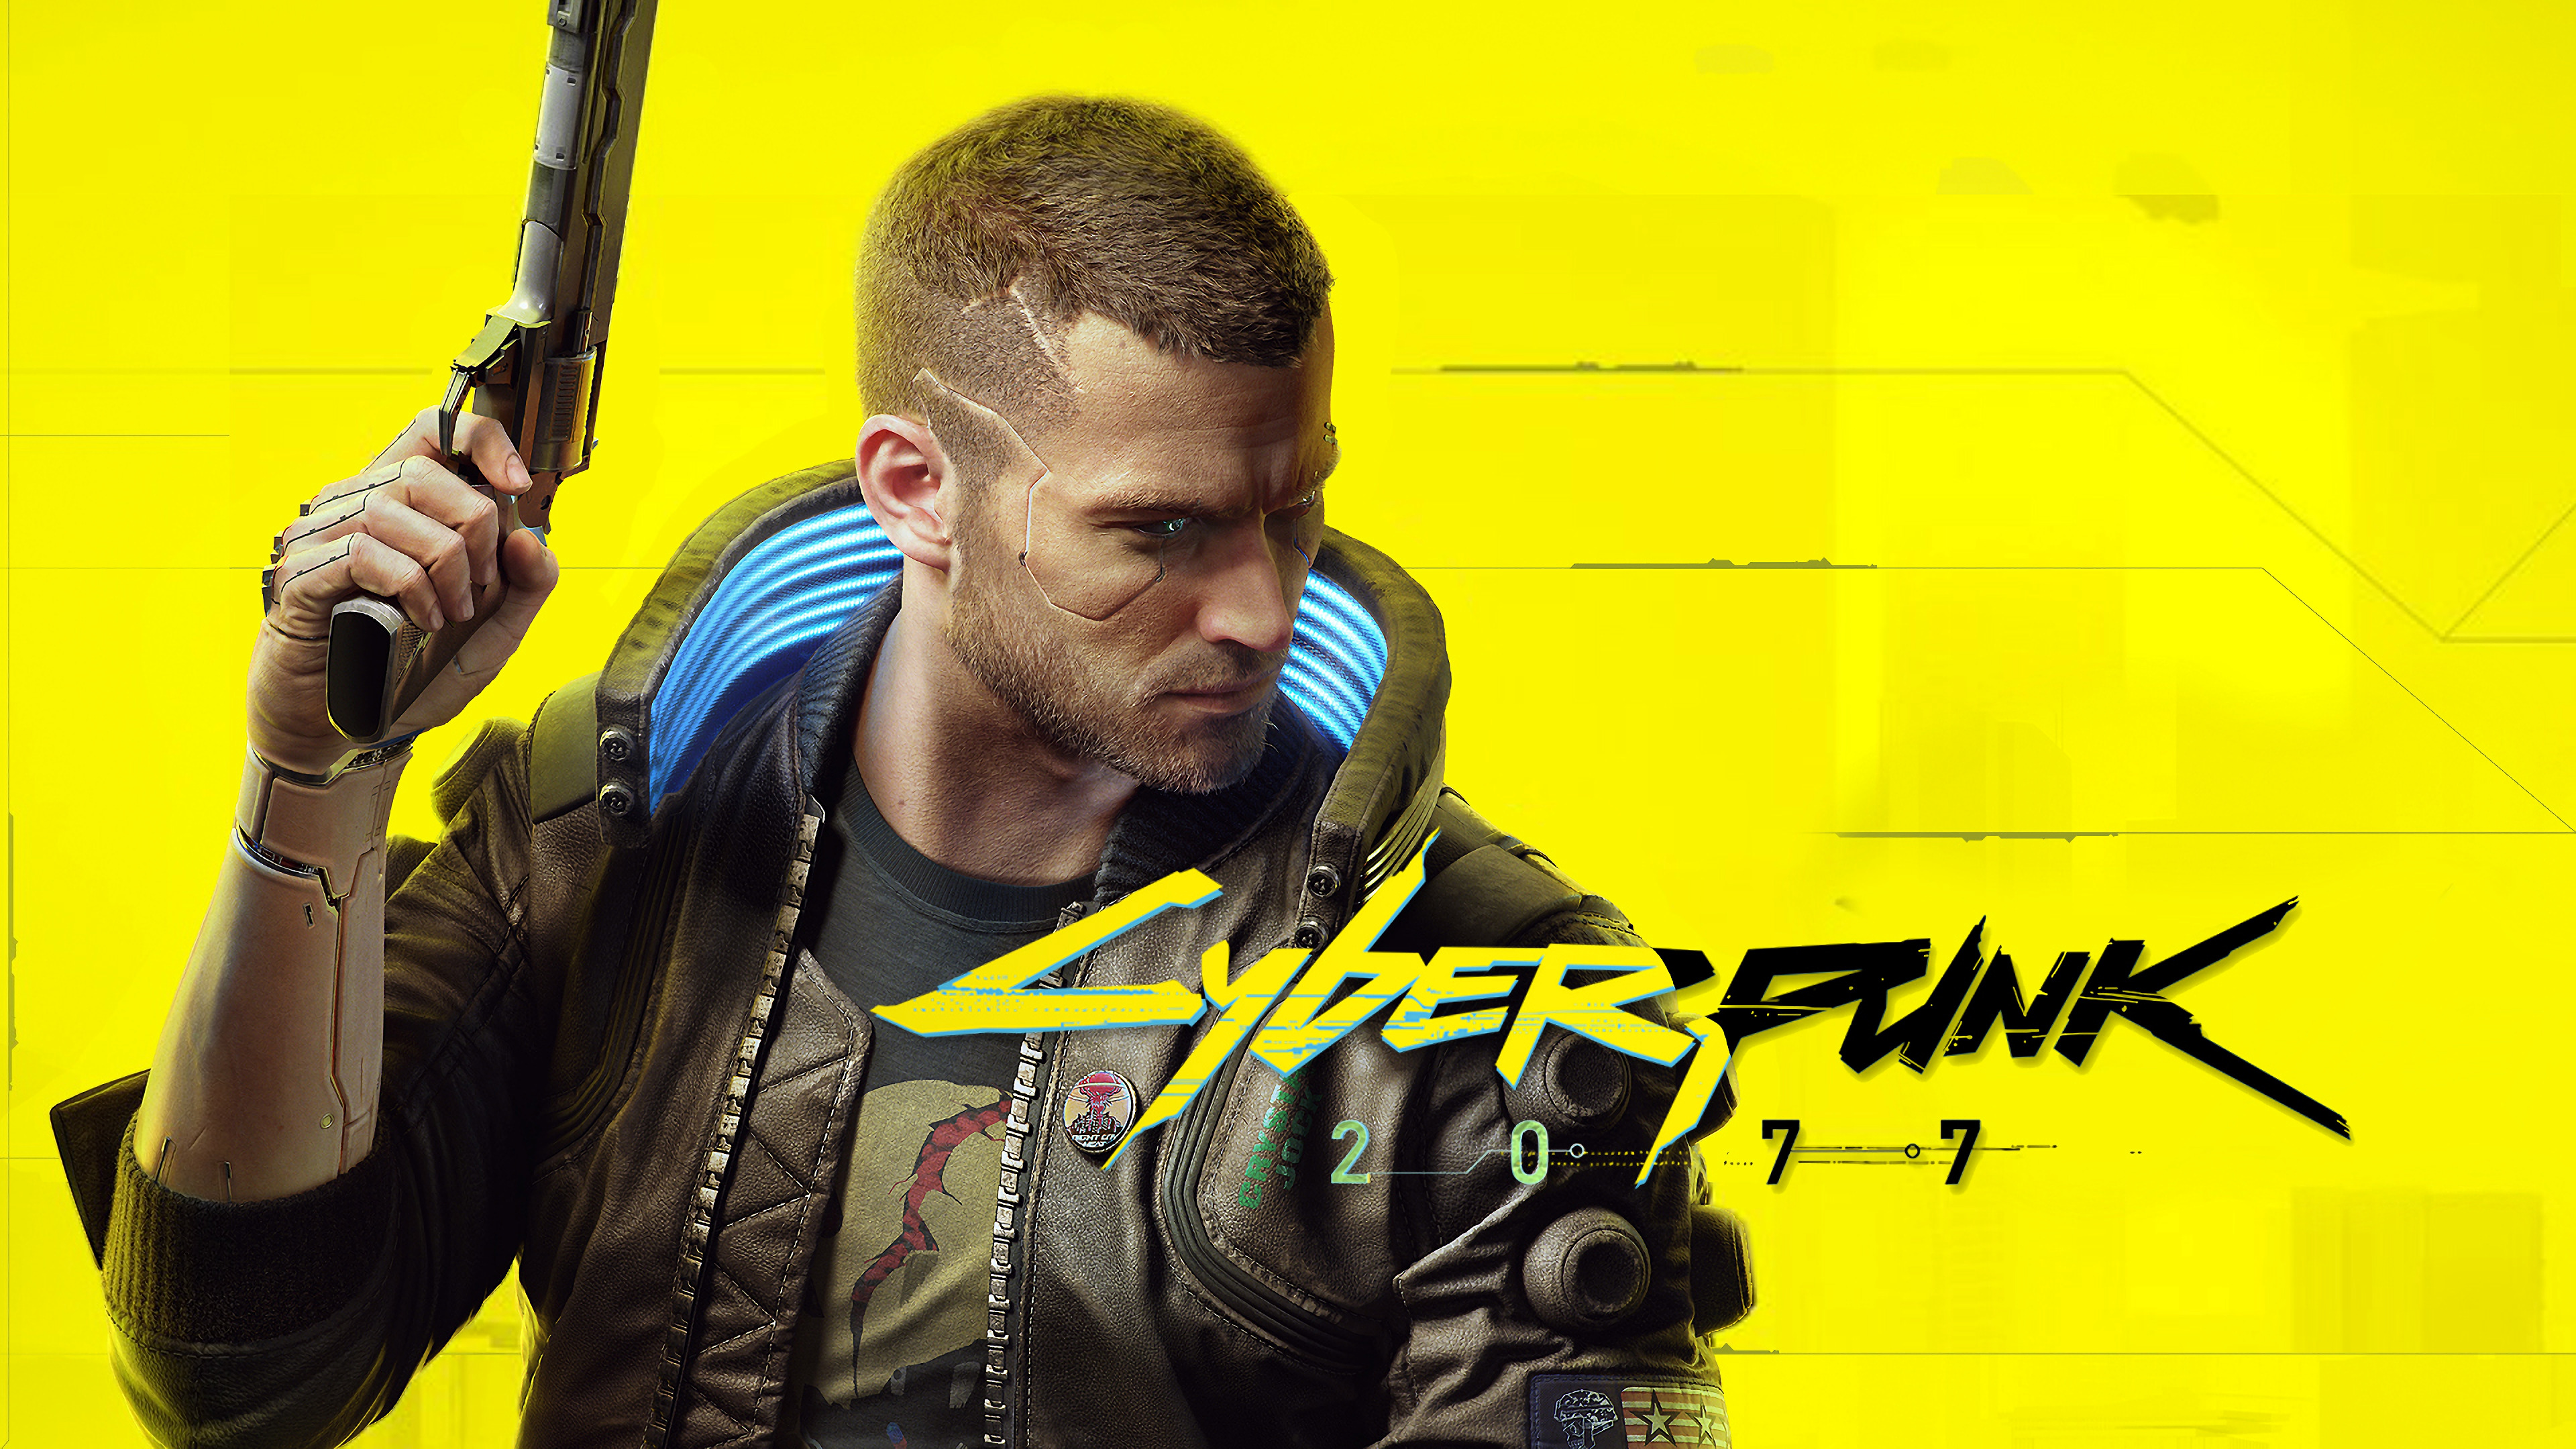 Cyberpunk 2077, V, 4K, #103 Wallpaper